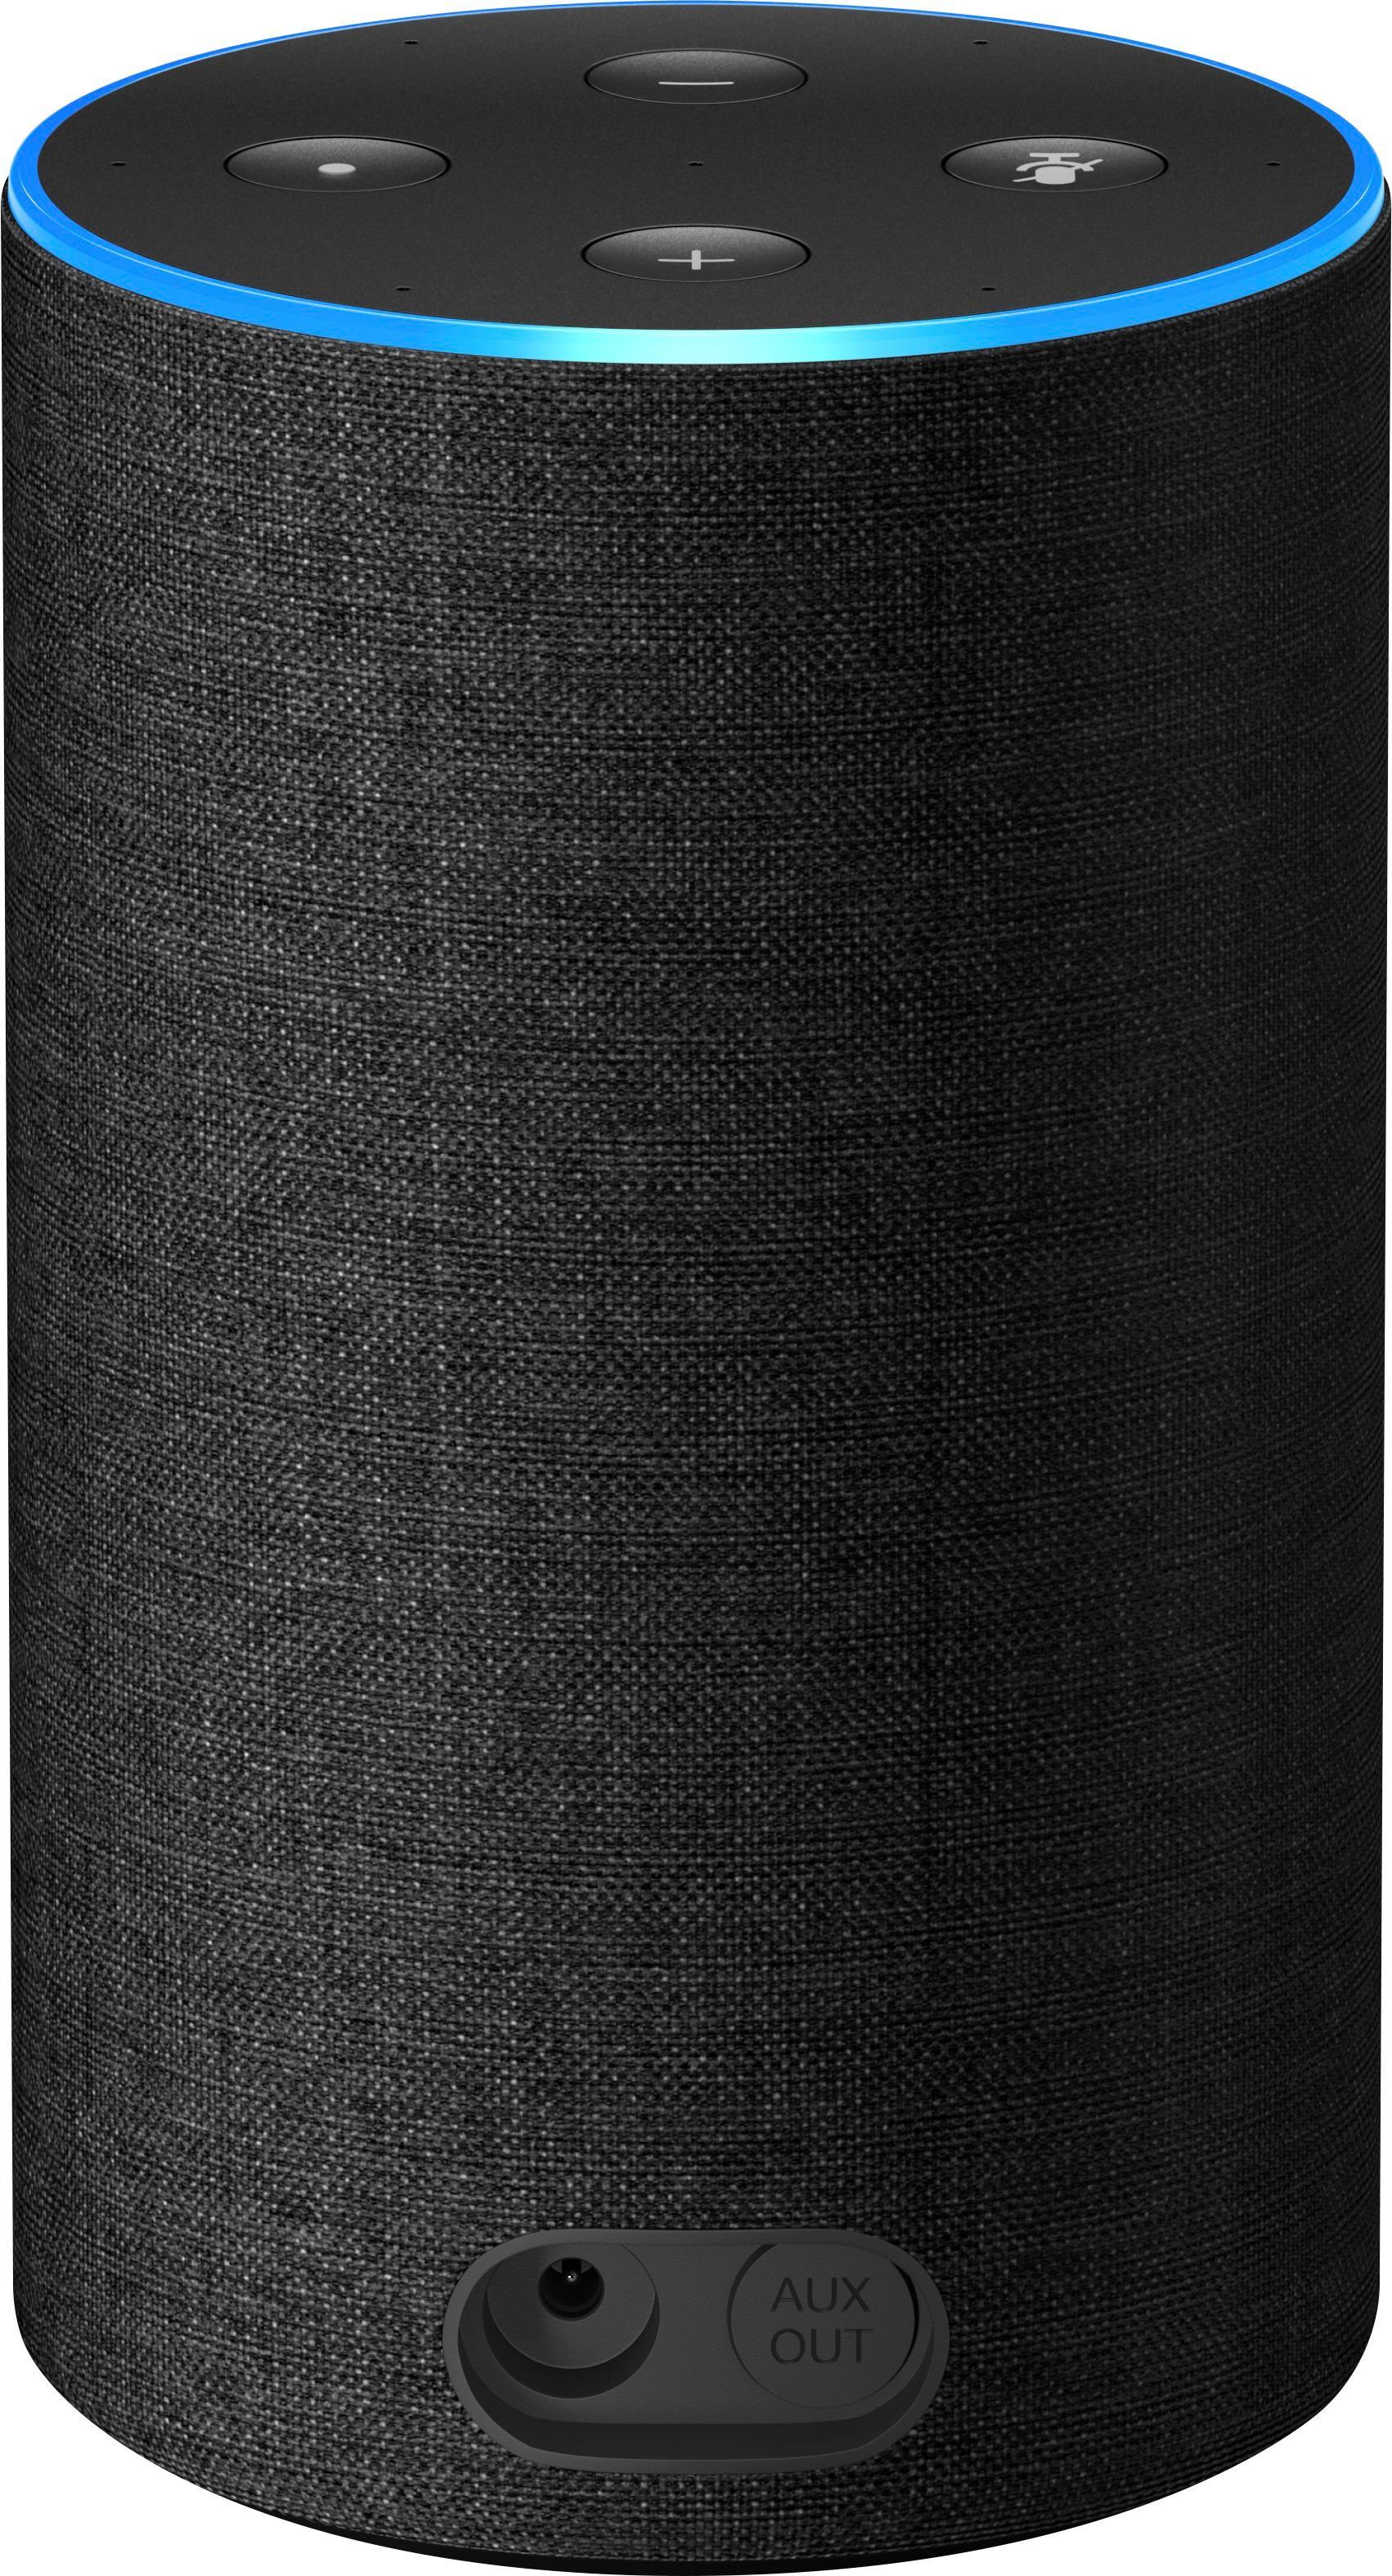 Amazon Echo (2nd Generation) Alexa-enabled Bluetooth Speaker $49.97